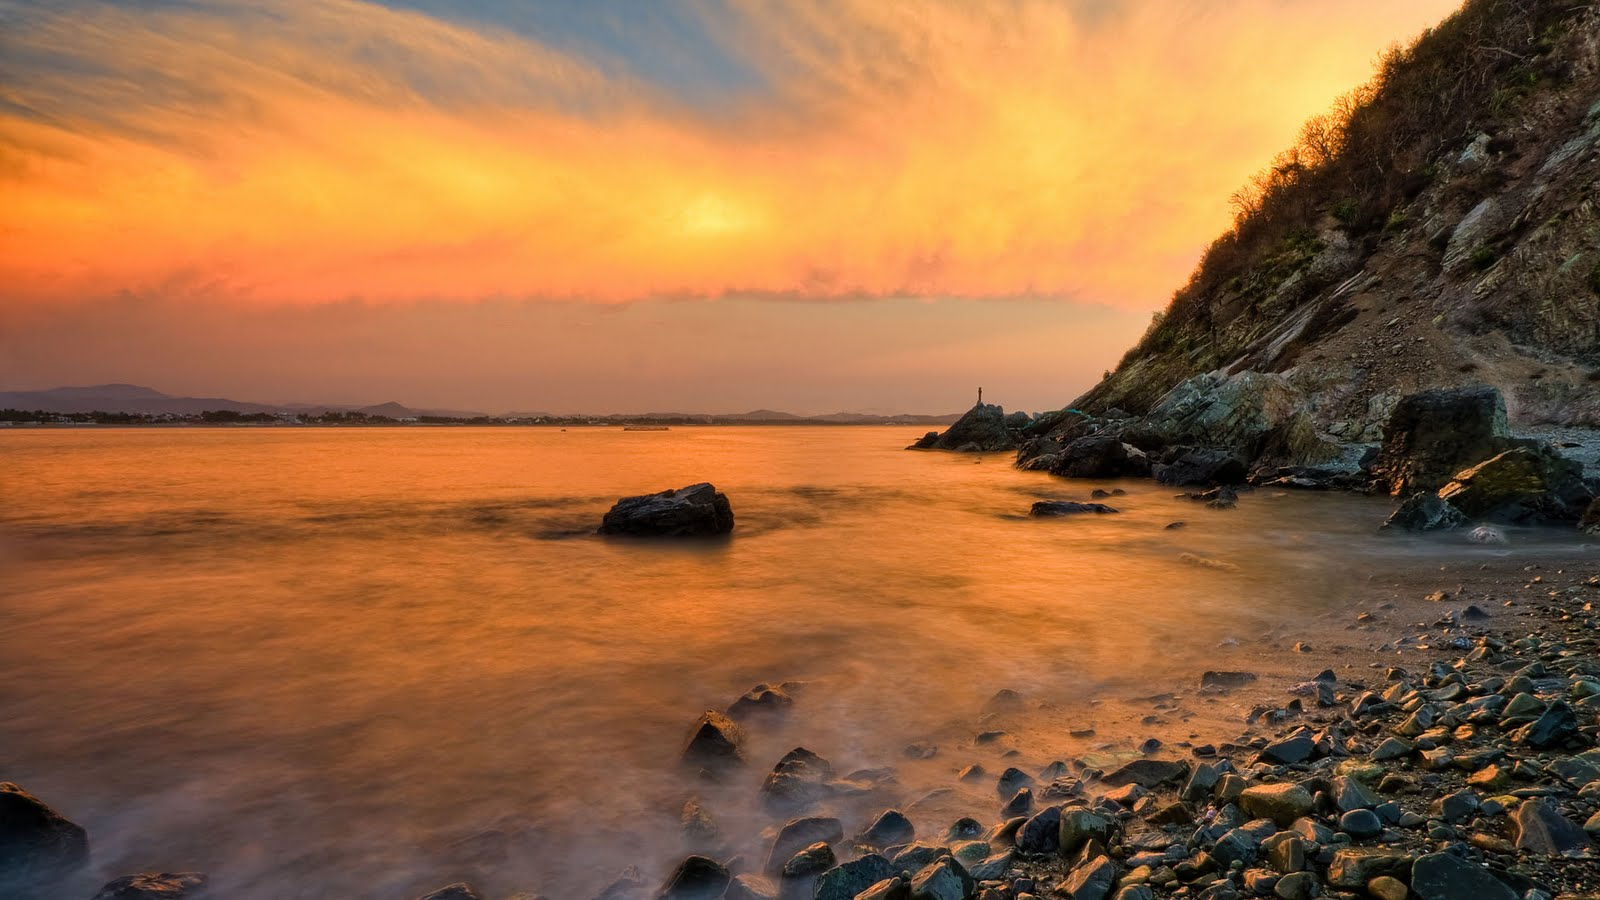 Jaspreet Rekhi: 20 Amazing Landscapes Full HD Wallpapers